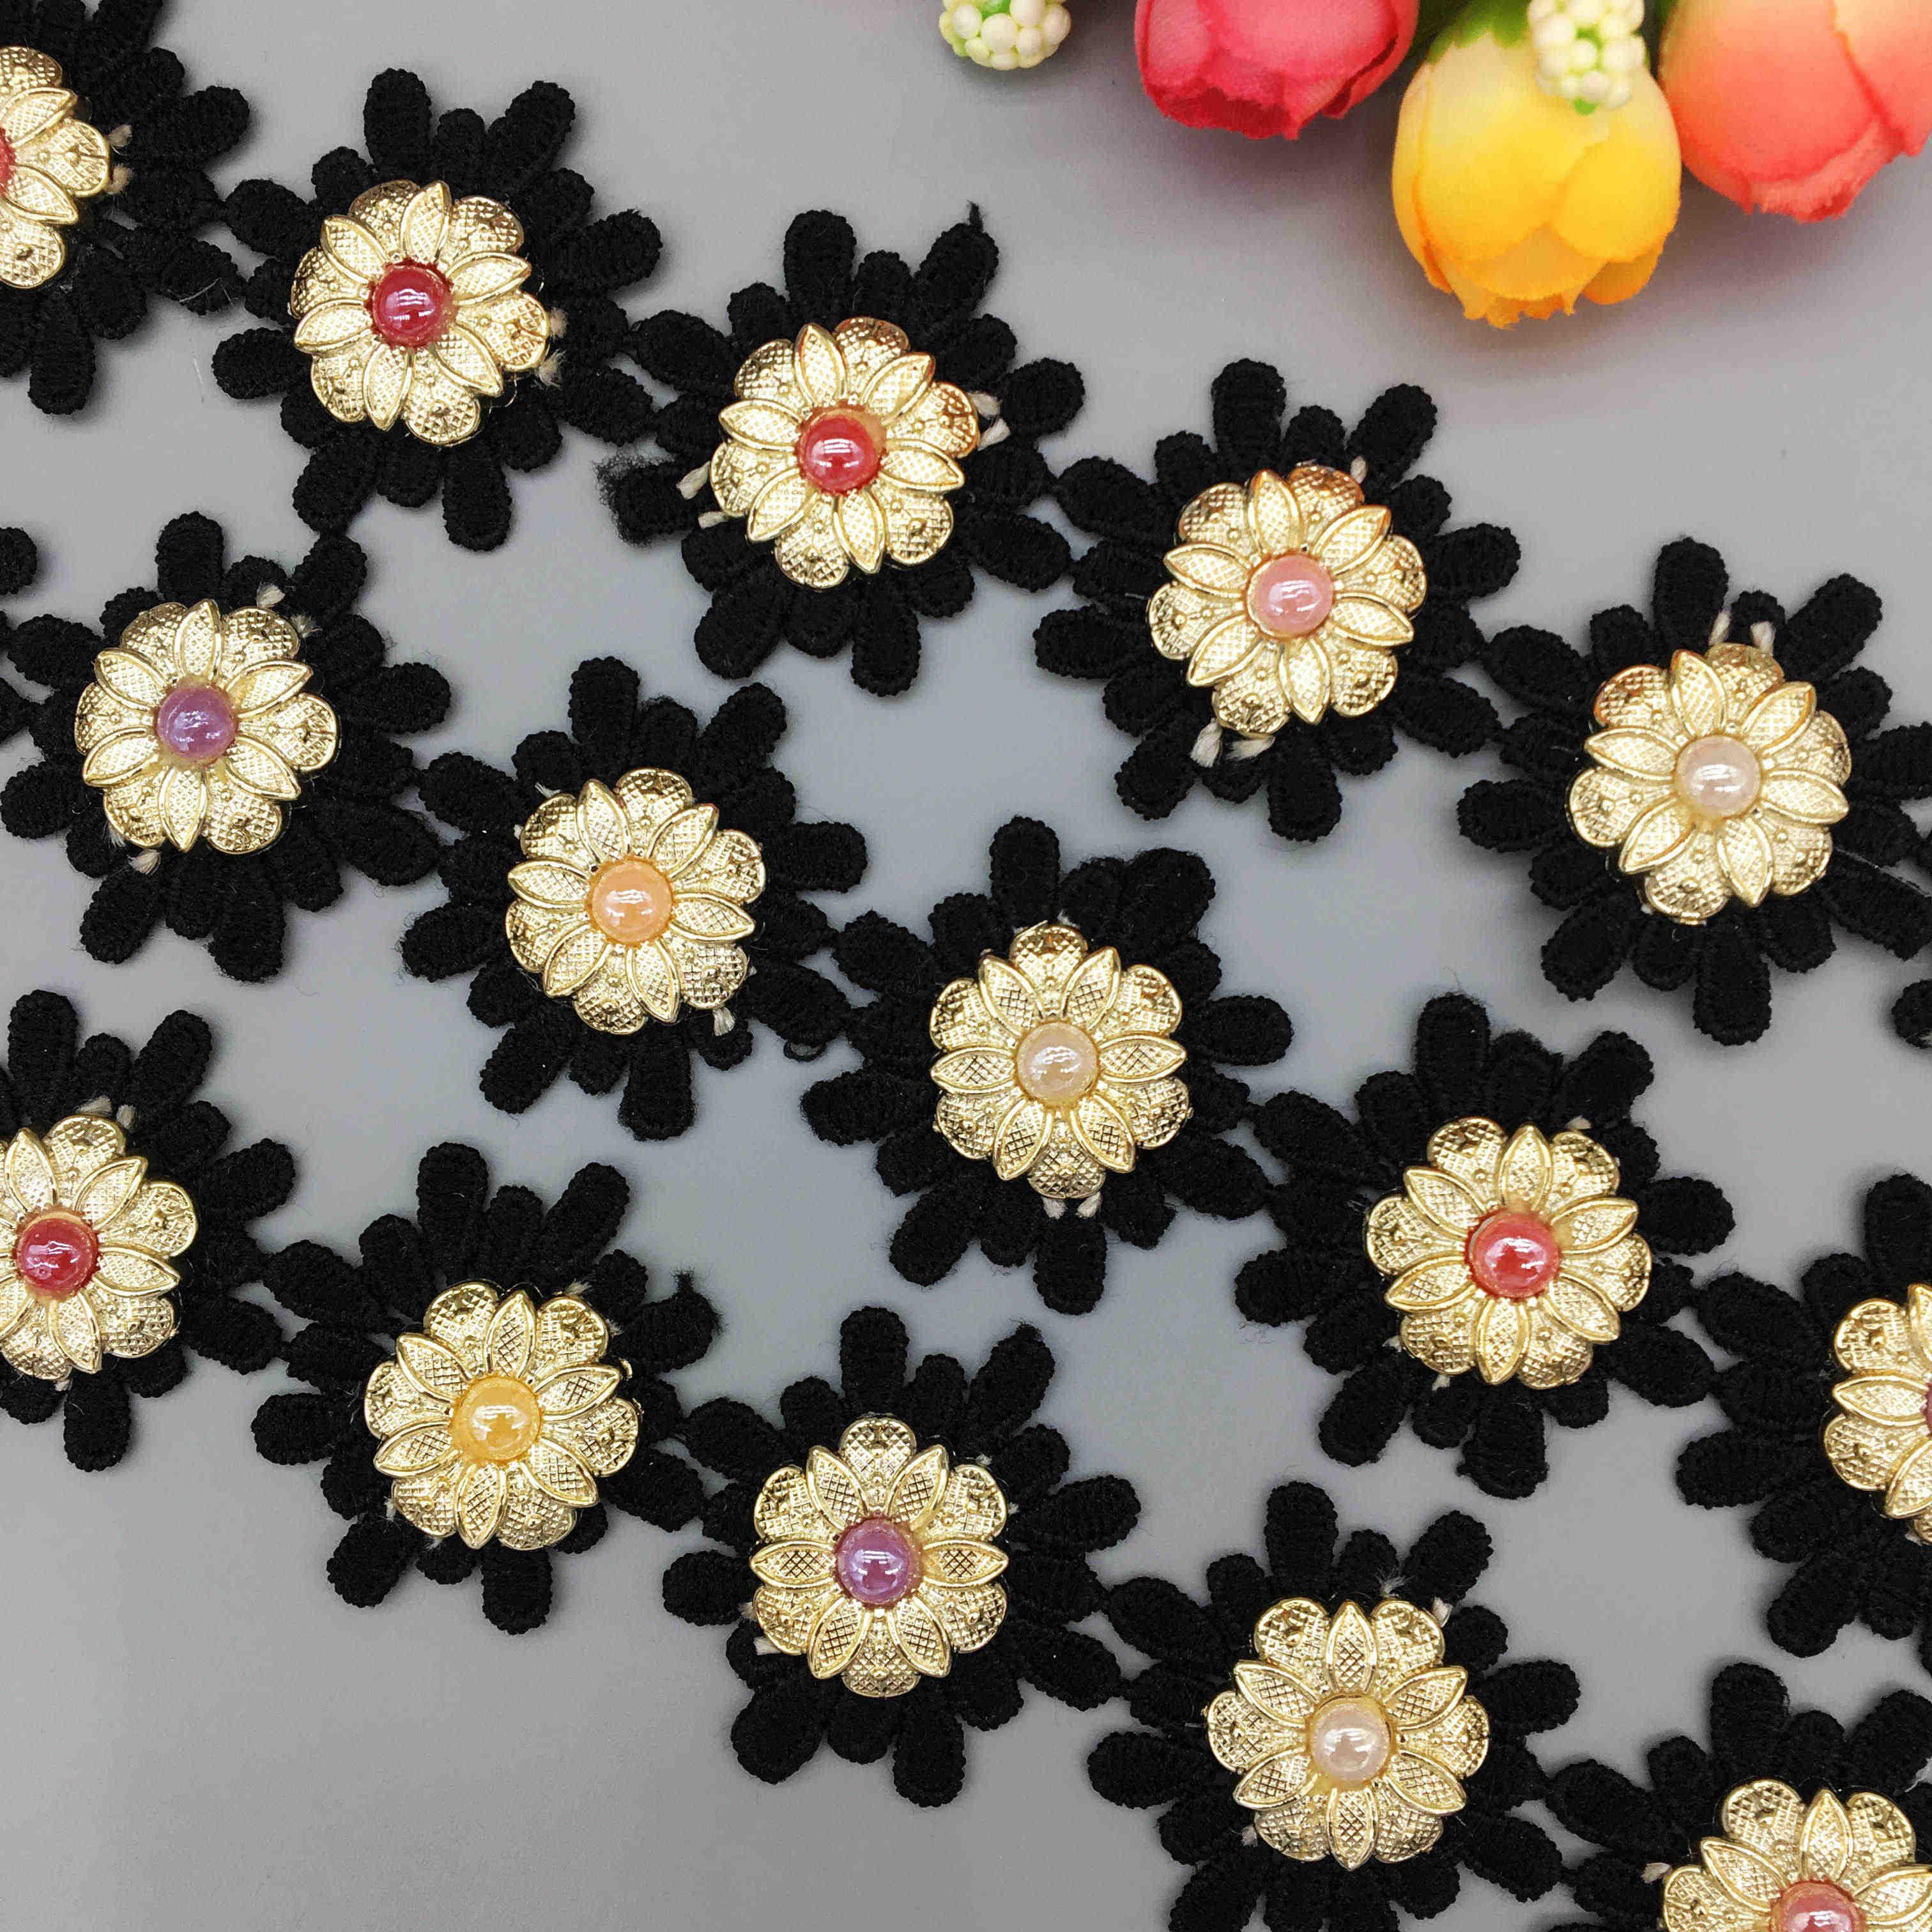 20x Nigeriaanse Stof Zwart Daisy Bloem Strass Kant Trim Lint Geborduurd Vintage Applique DIY Trouwjurk Naaien Craft